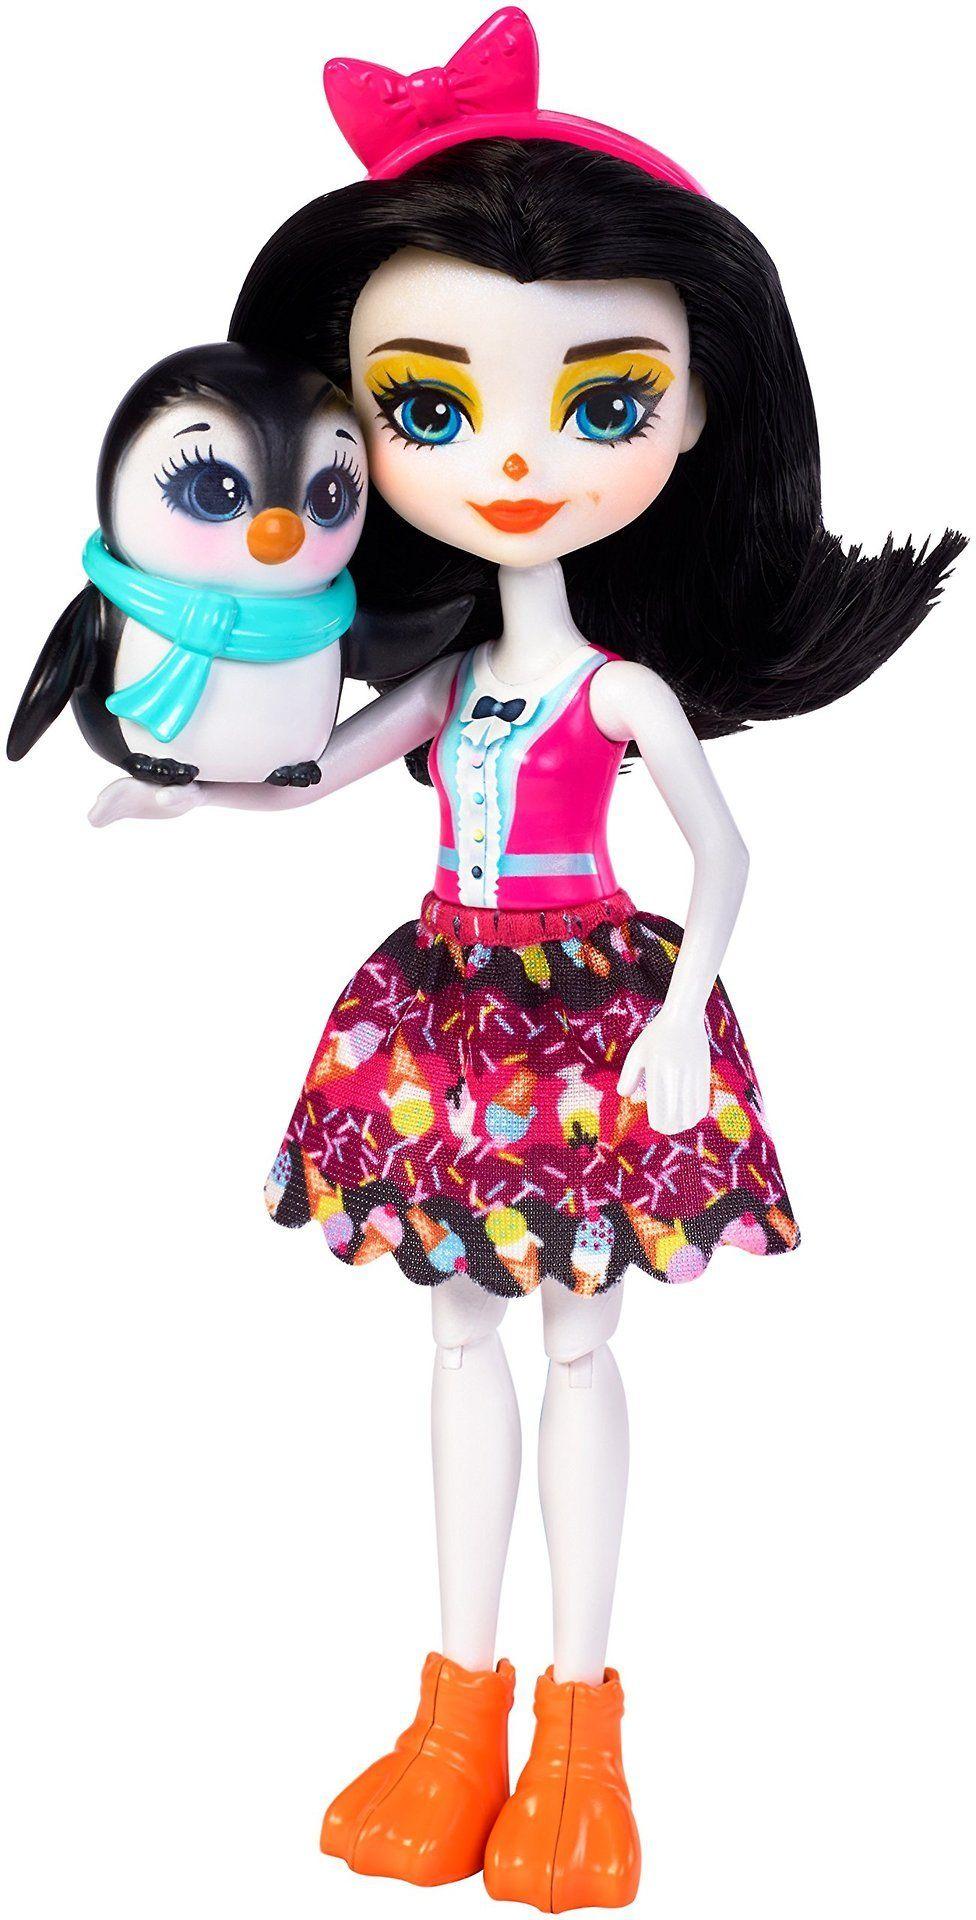 Pin By Luiza Kowalska On Enchantimals Dolls Enchanted Doll Barbie Styling Head Dolls